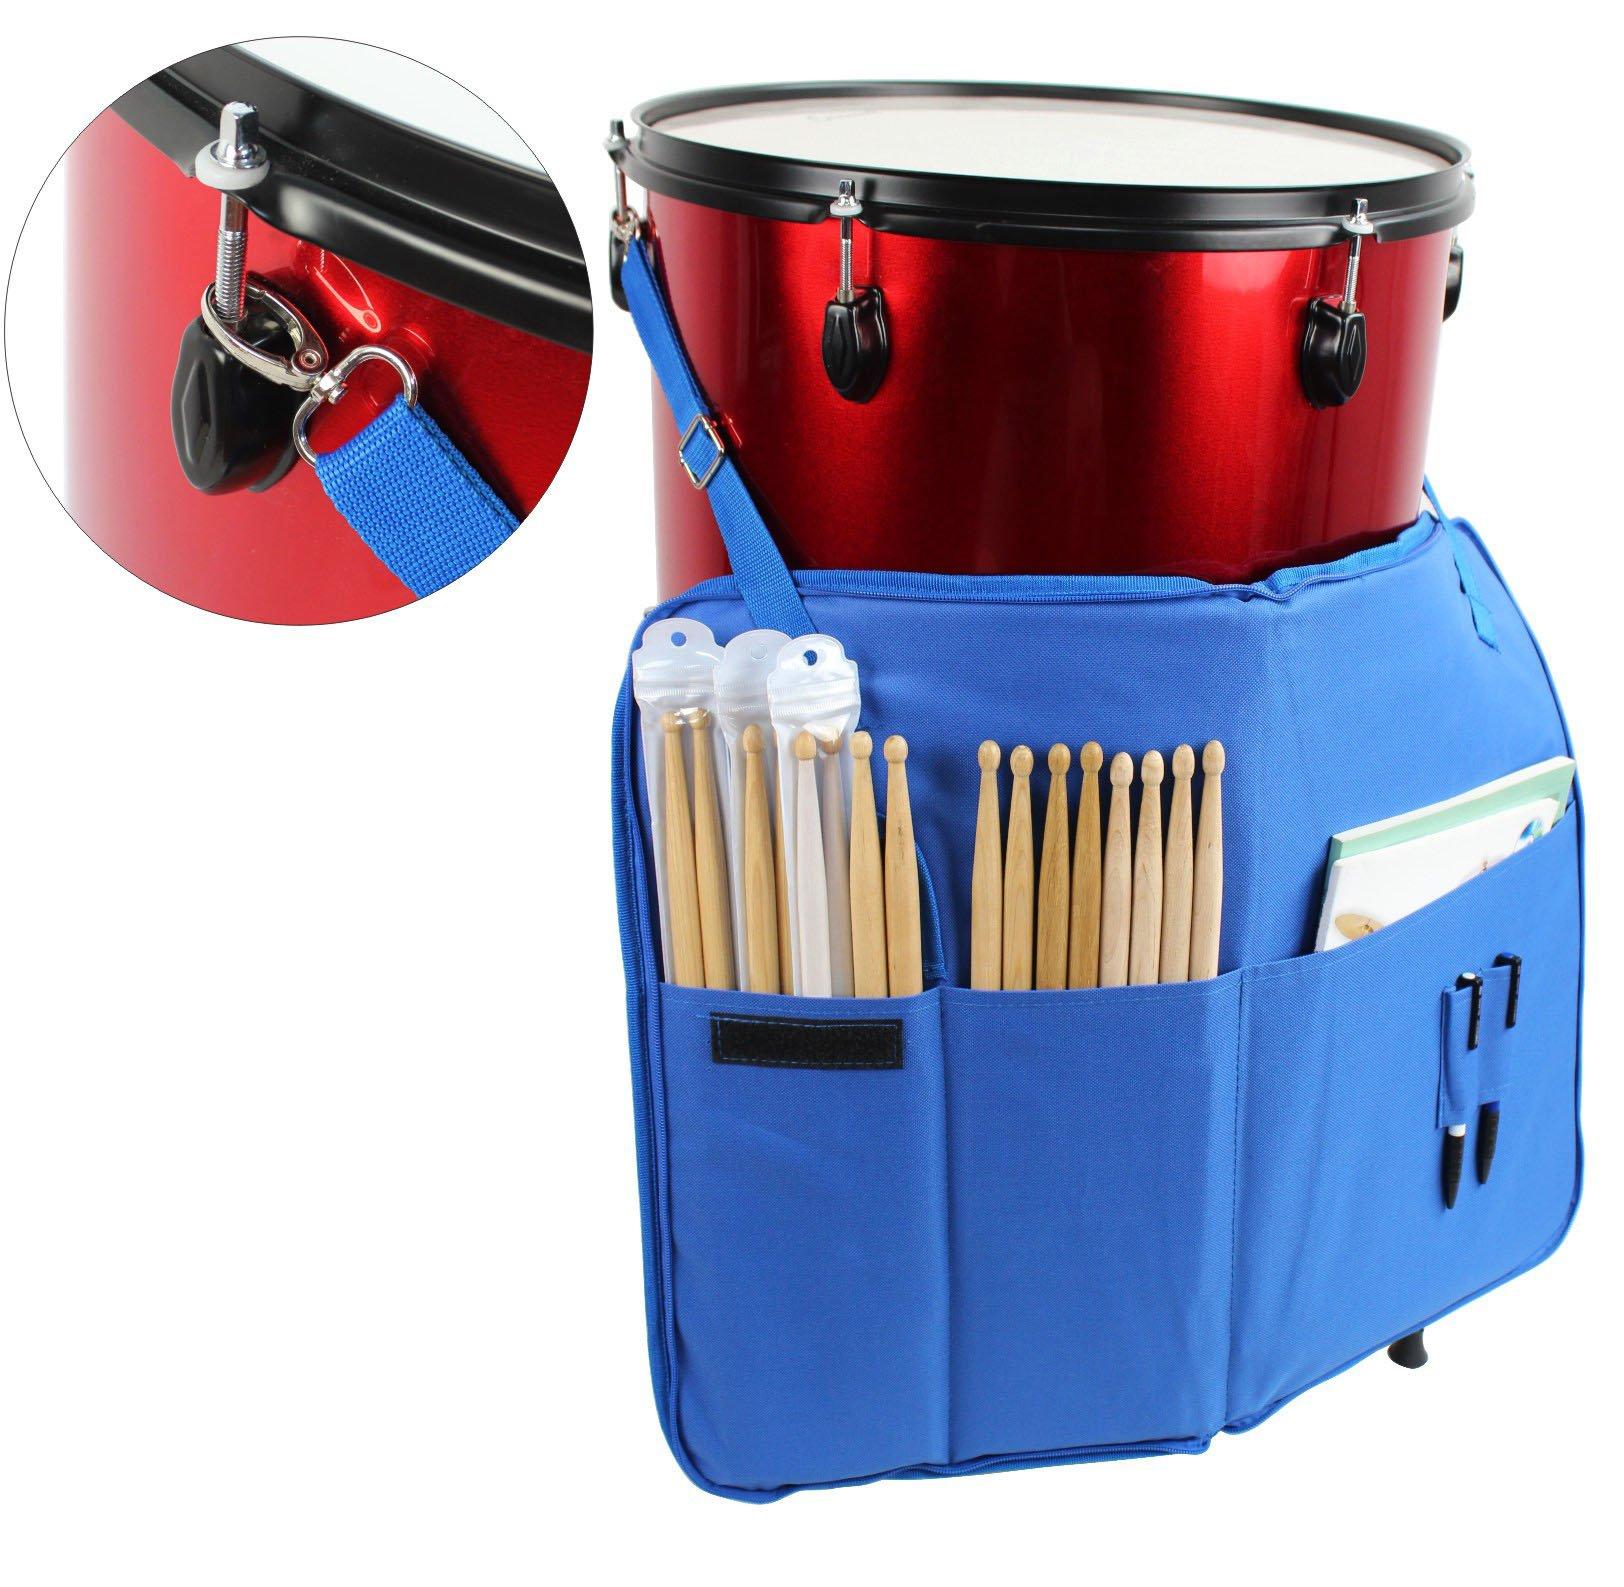 YMC DSB20-BU Pro Drum Stick Bag Holder 15mm Foam - Blue